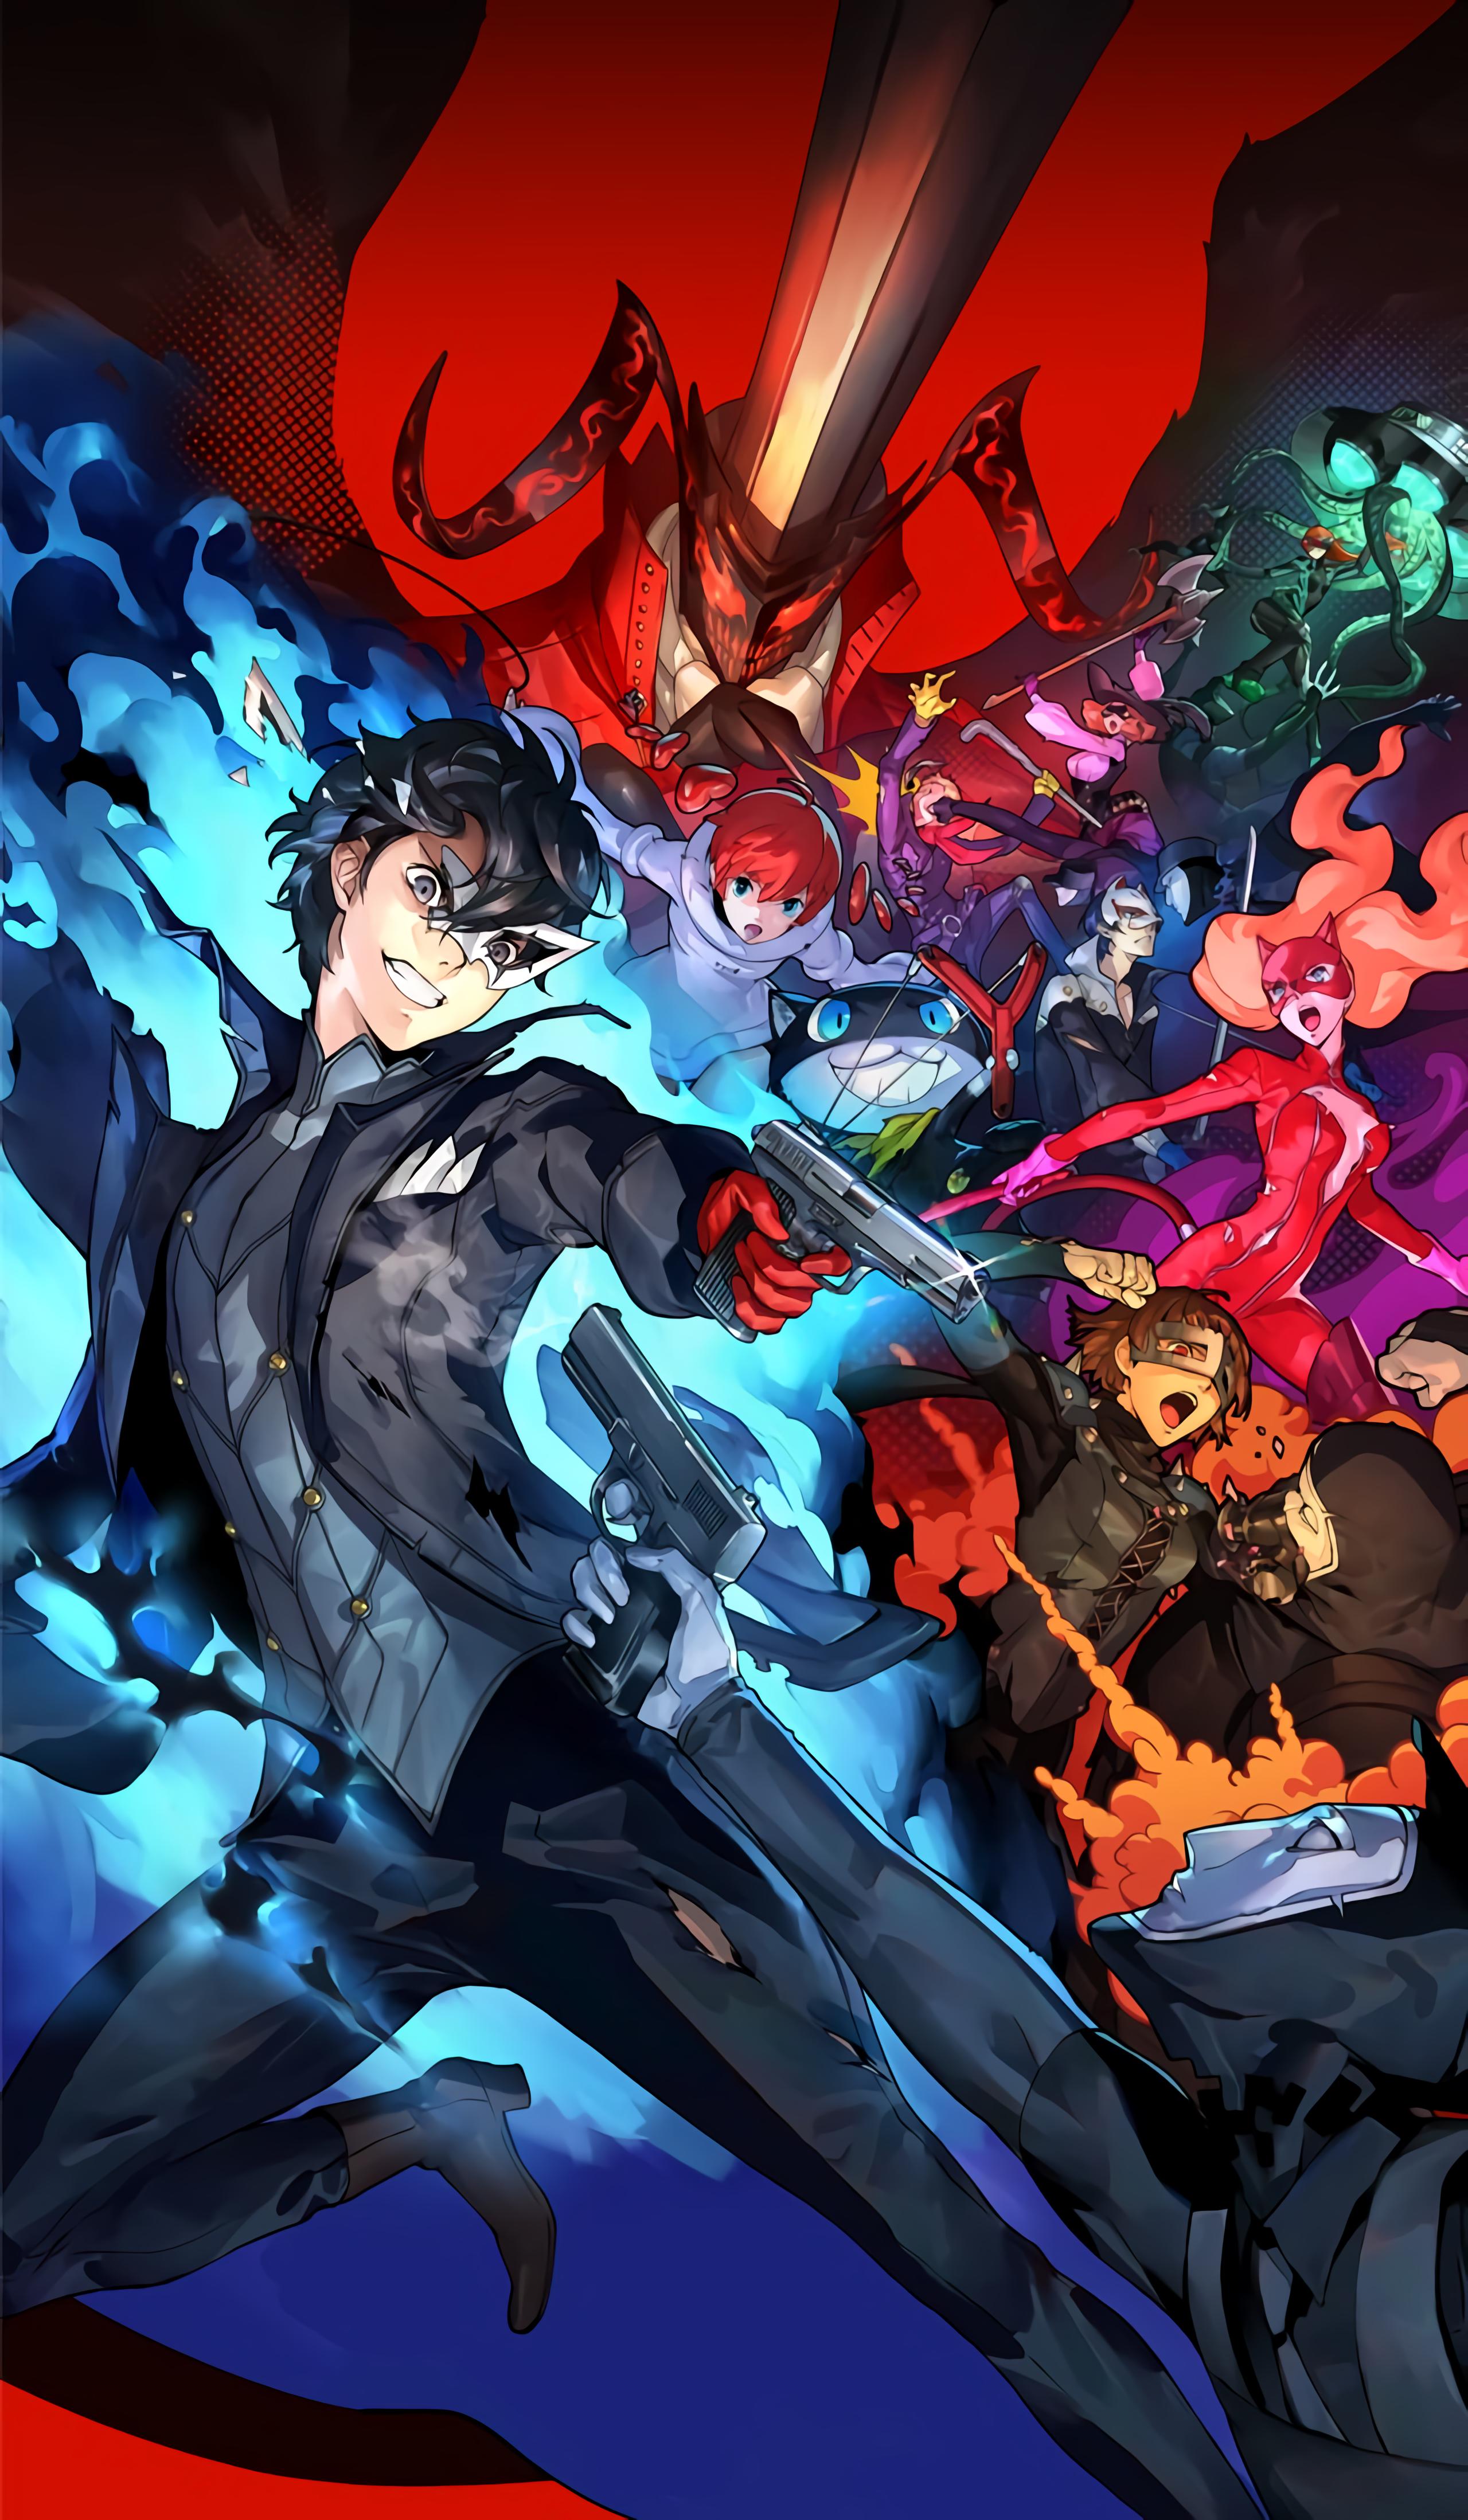 Persona 5 Scramble Artwork 2560x4396 Wallpaper Teahub Io